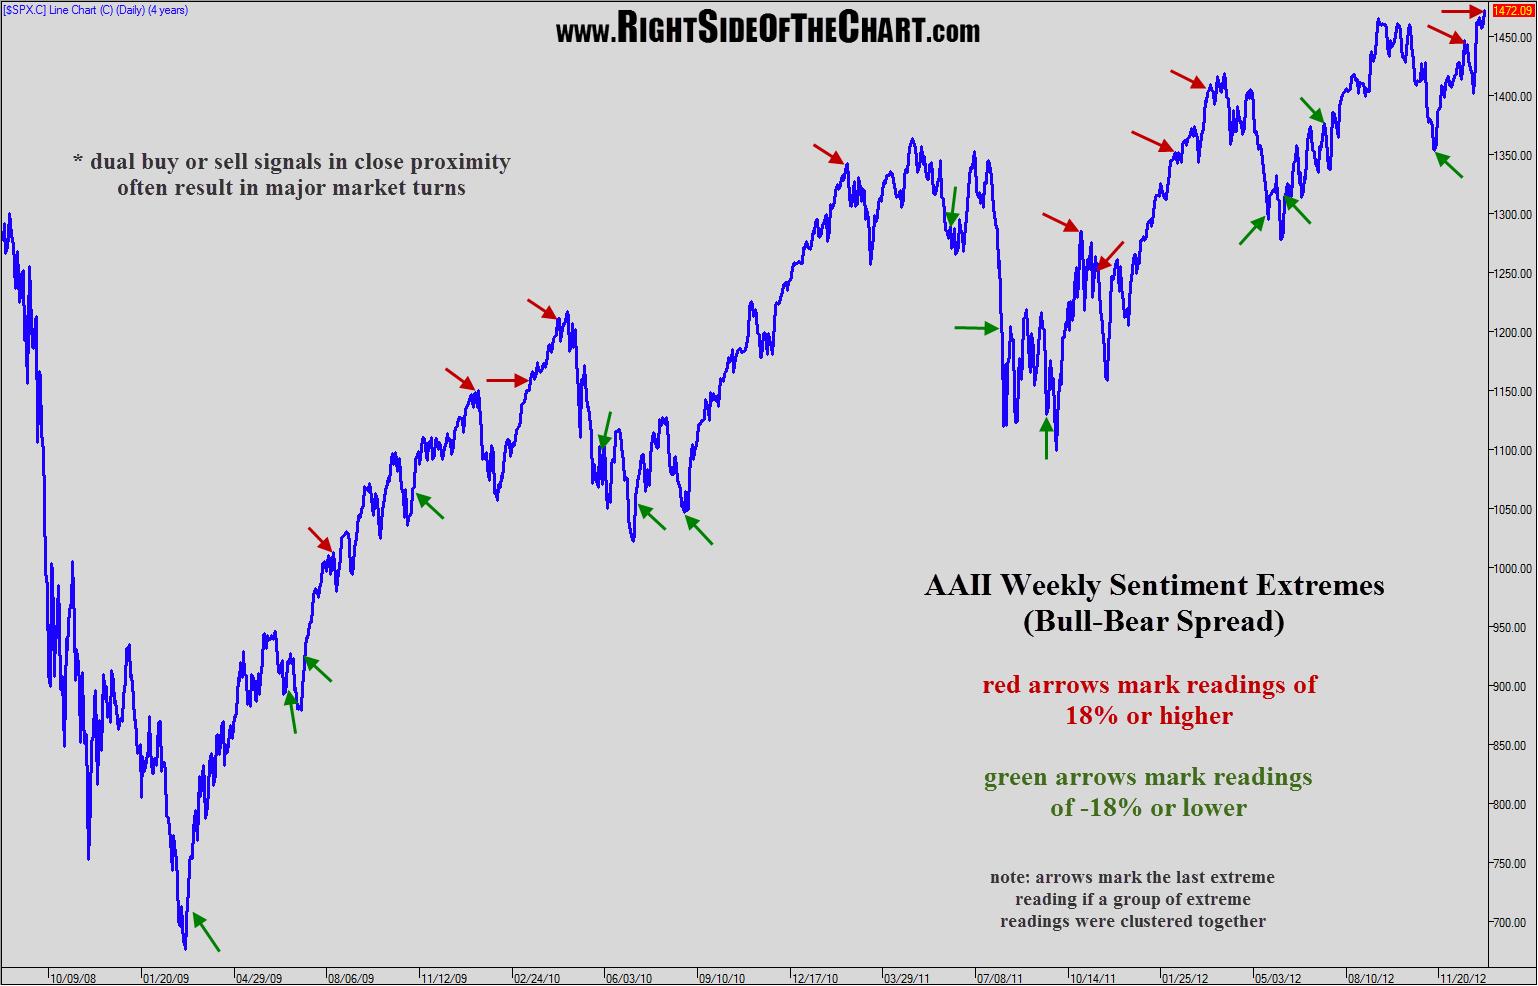 AAII bull-bear extremes